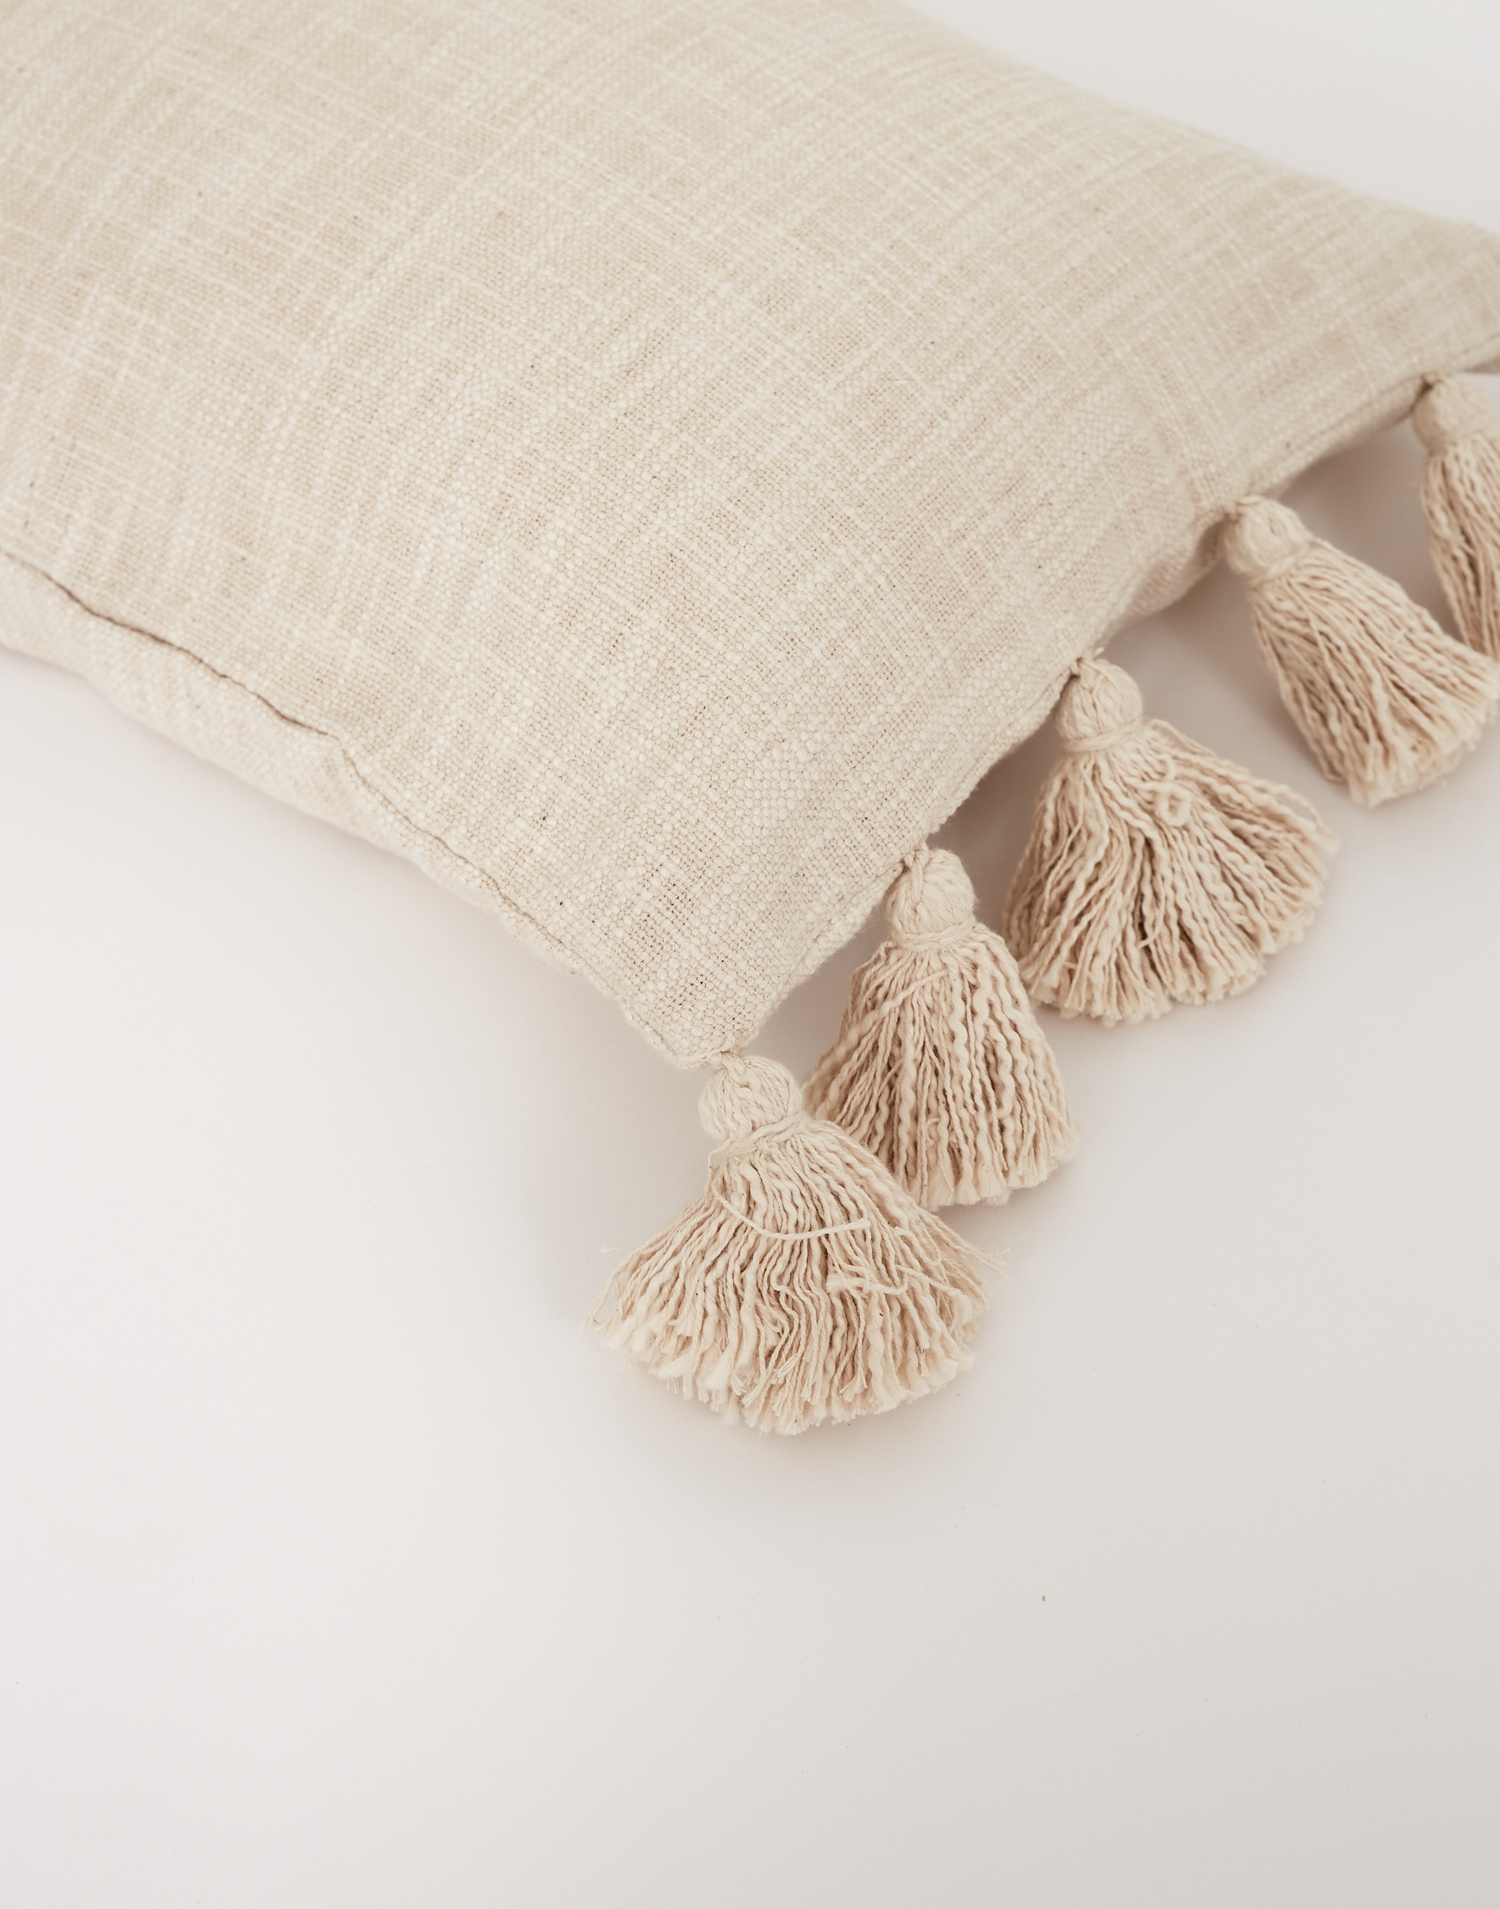 Tassels cushion cover 40*60